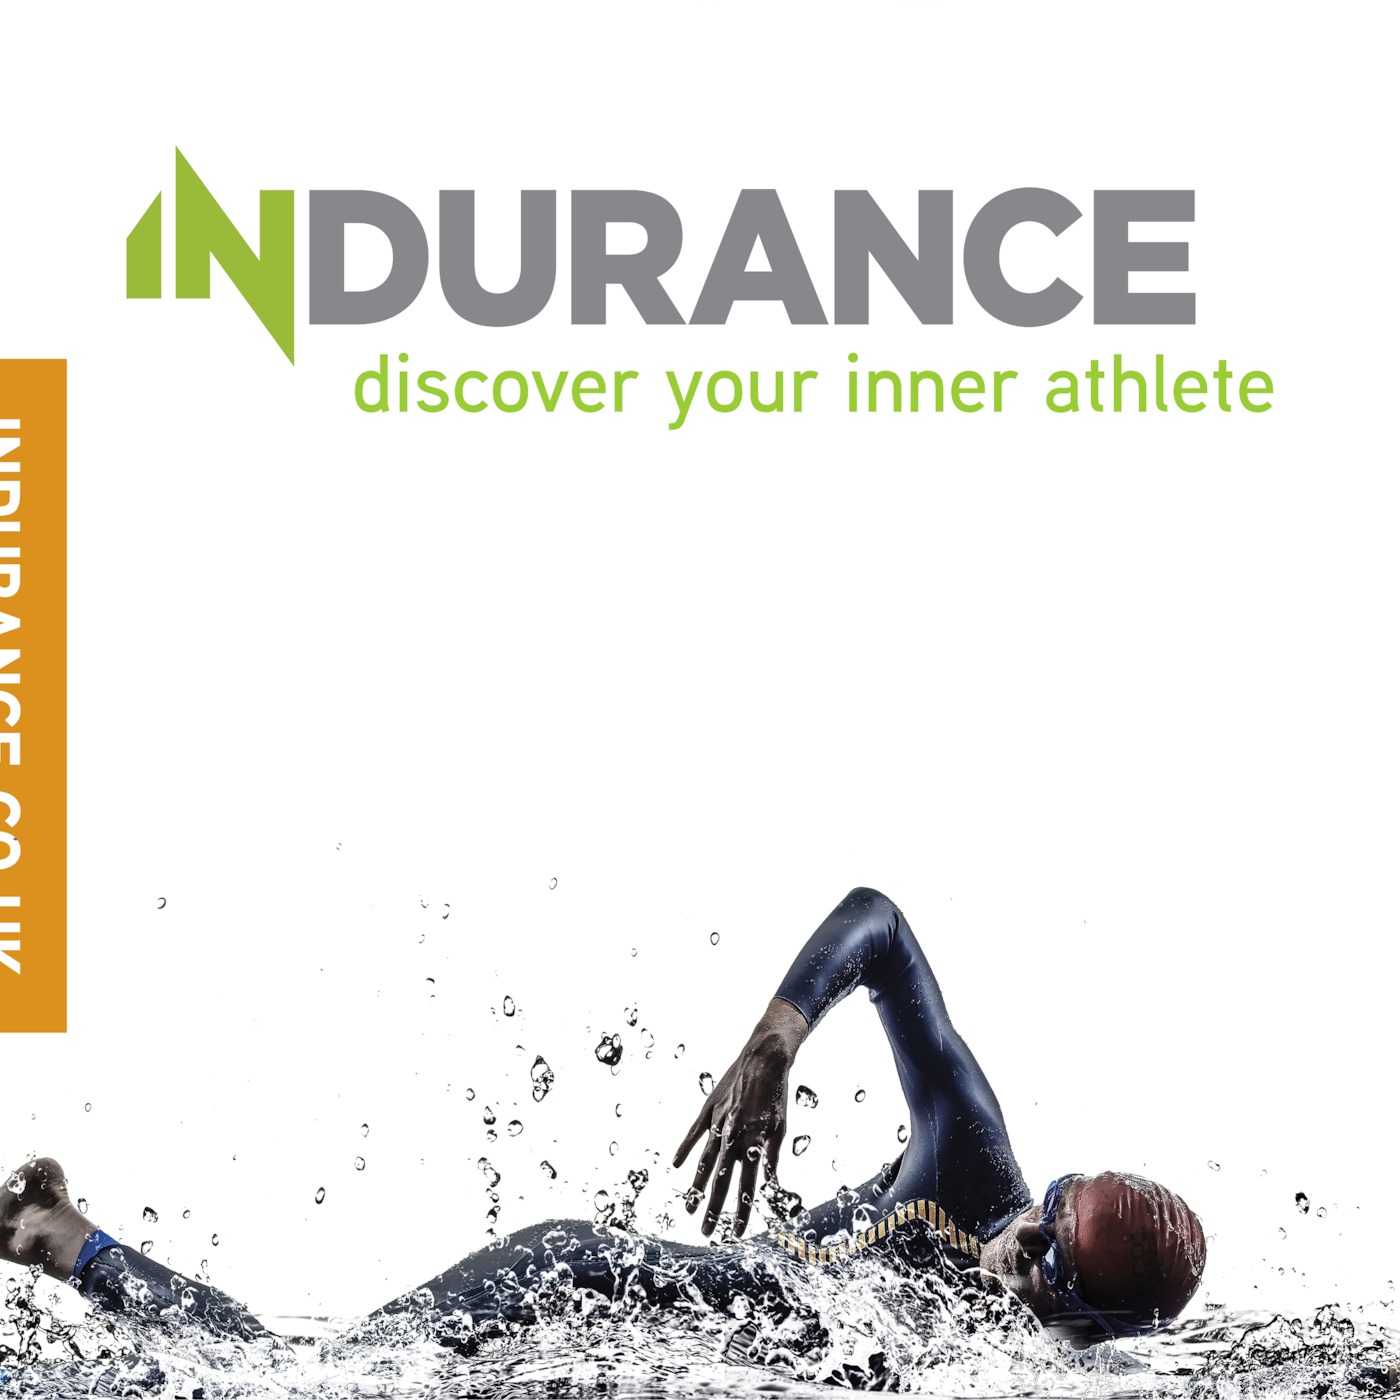 InDurance